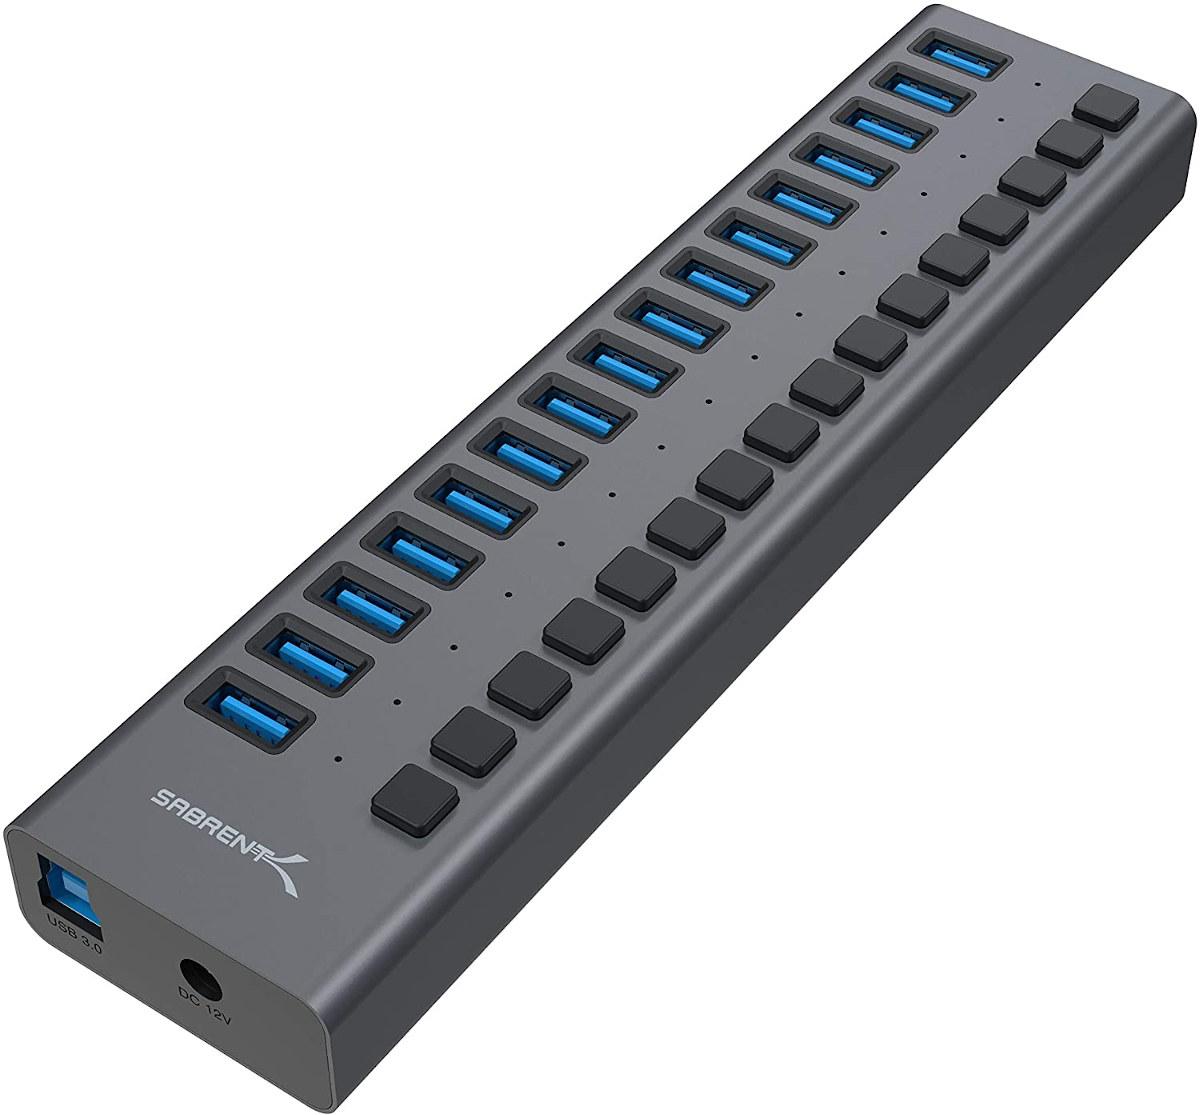 16-port USB 3.0 Hub